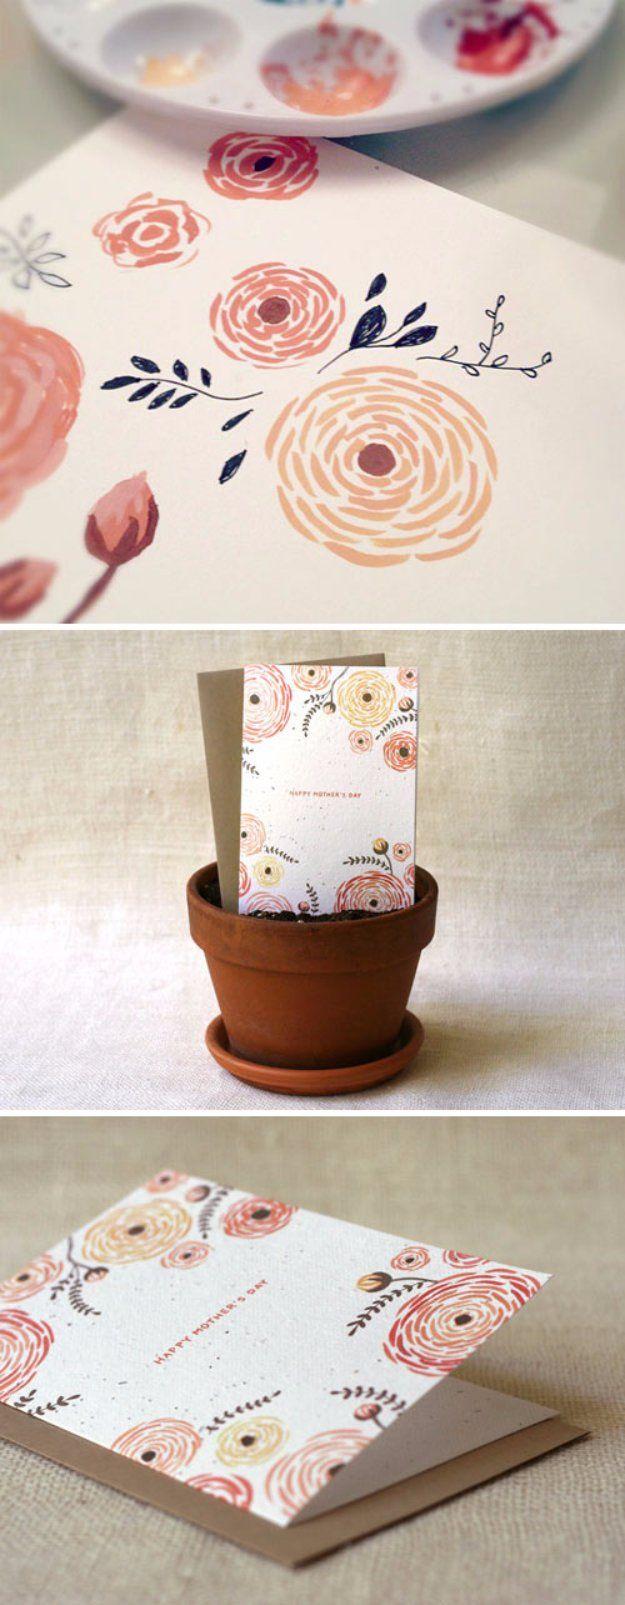 diy motherus day cards motherus day pinterest cards diy